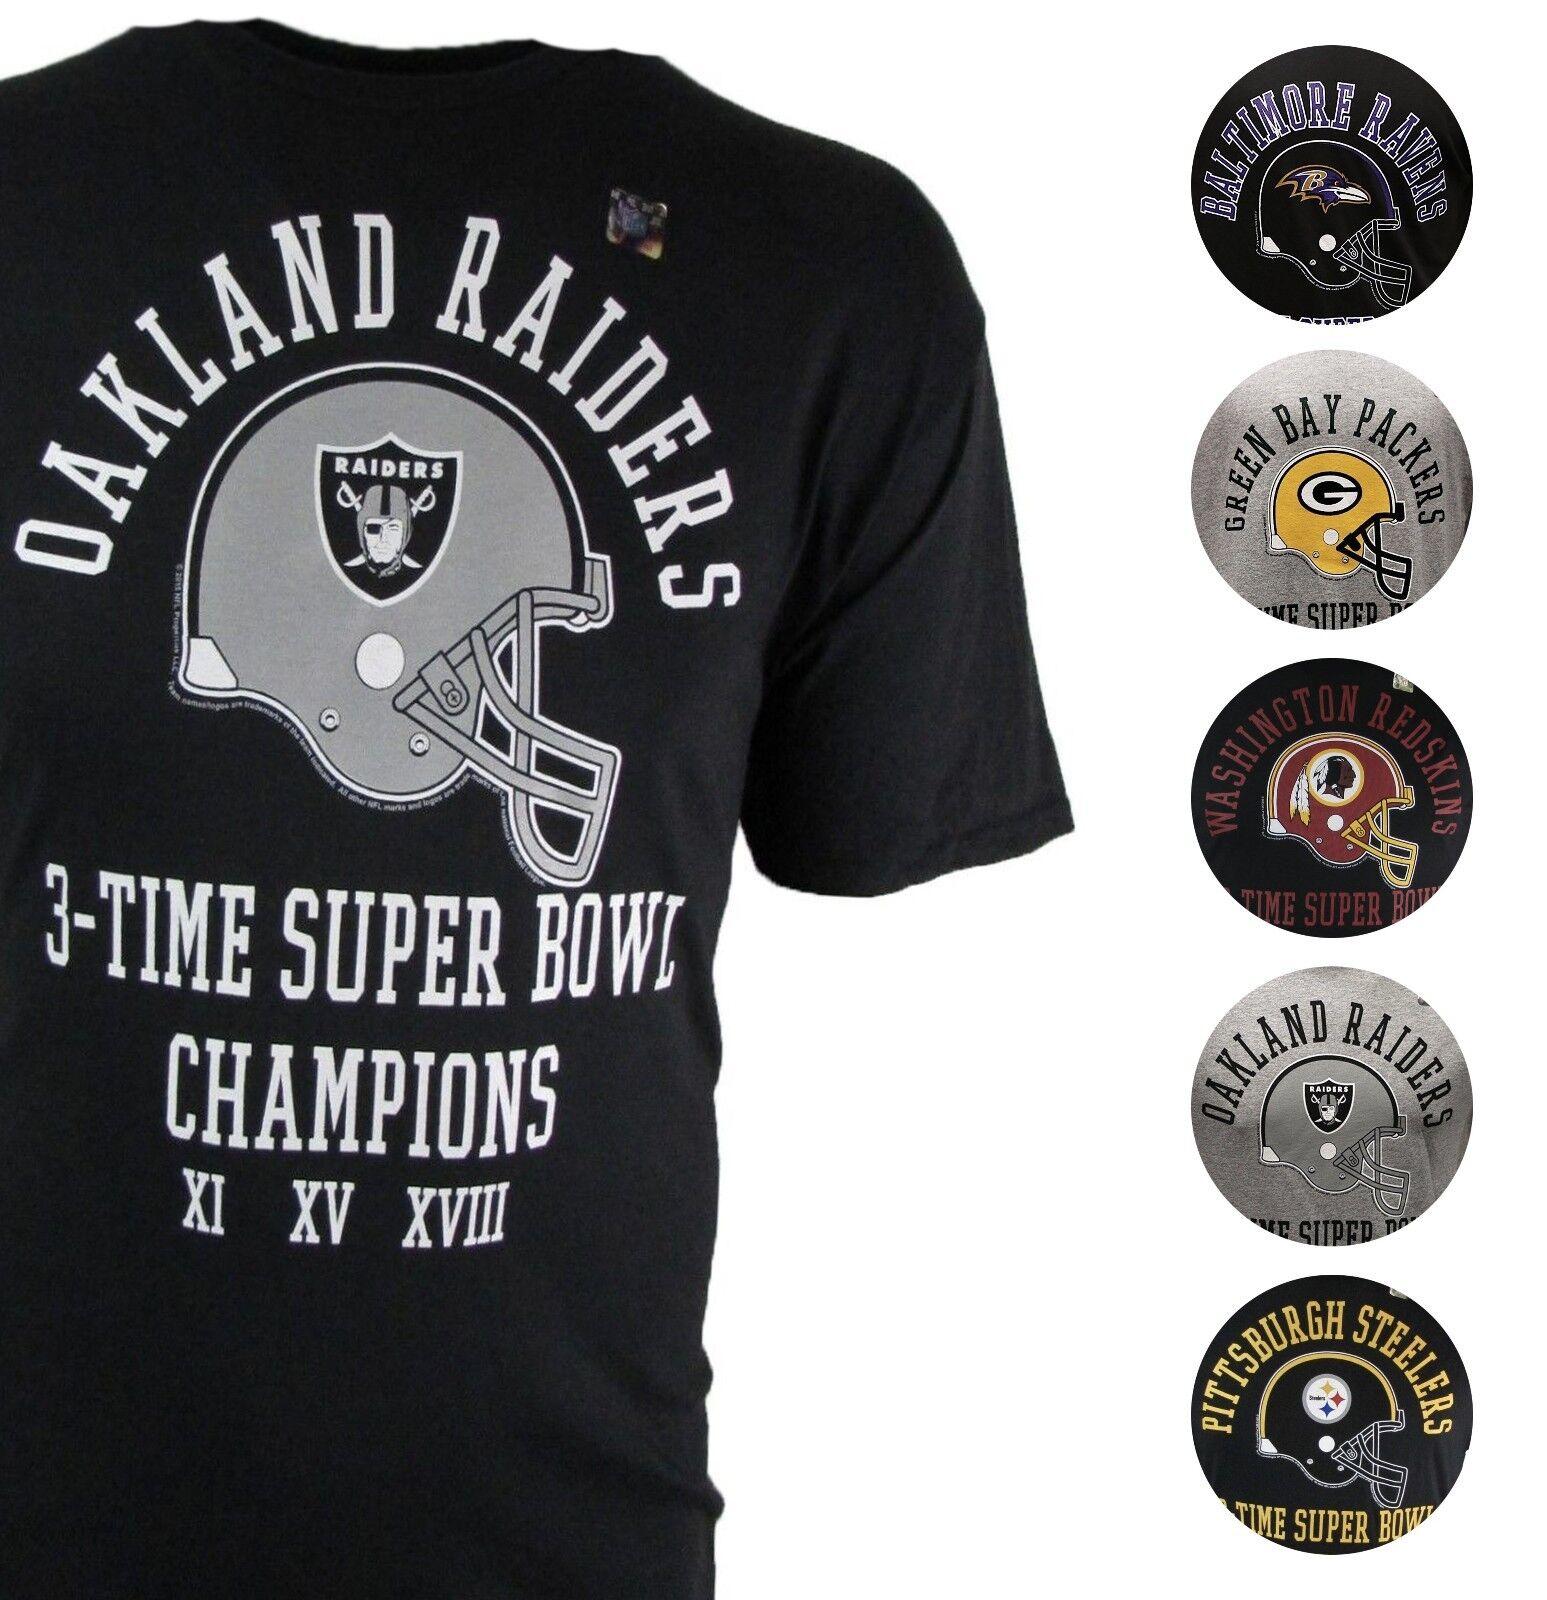 Medium NFL San Francisco 49Ers 5 Time Super Bowl Champ T-Shirt Gray